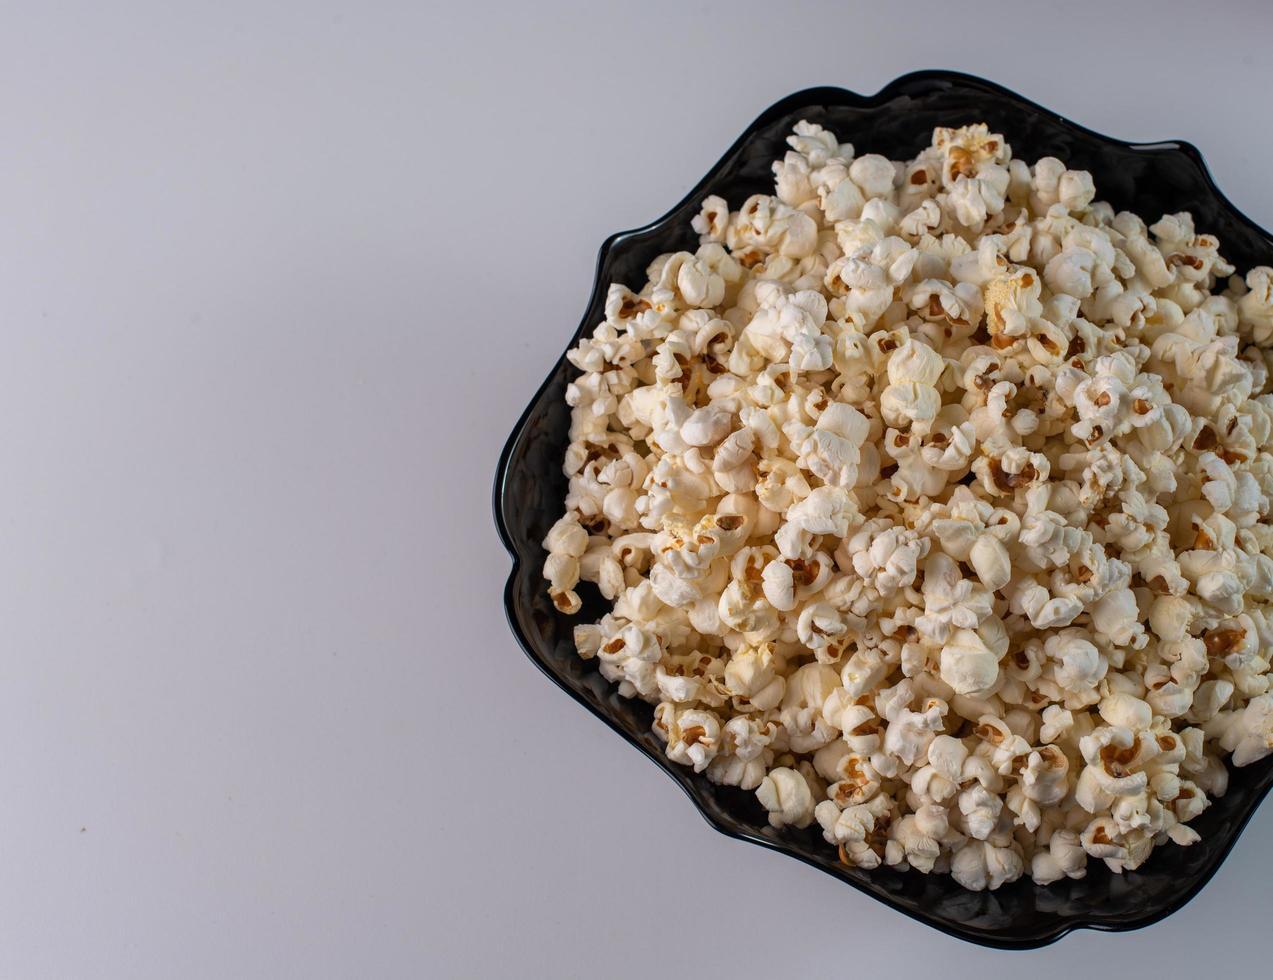 popcorn op witte achtergrond foto